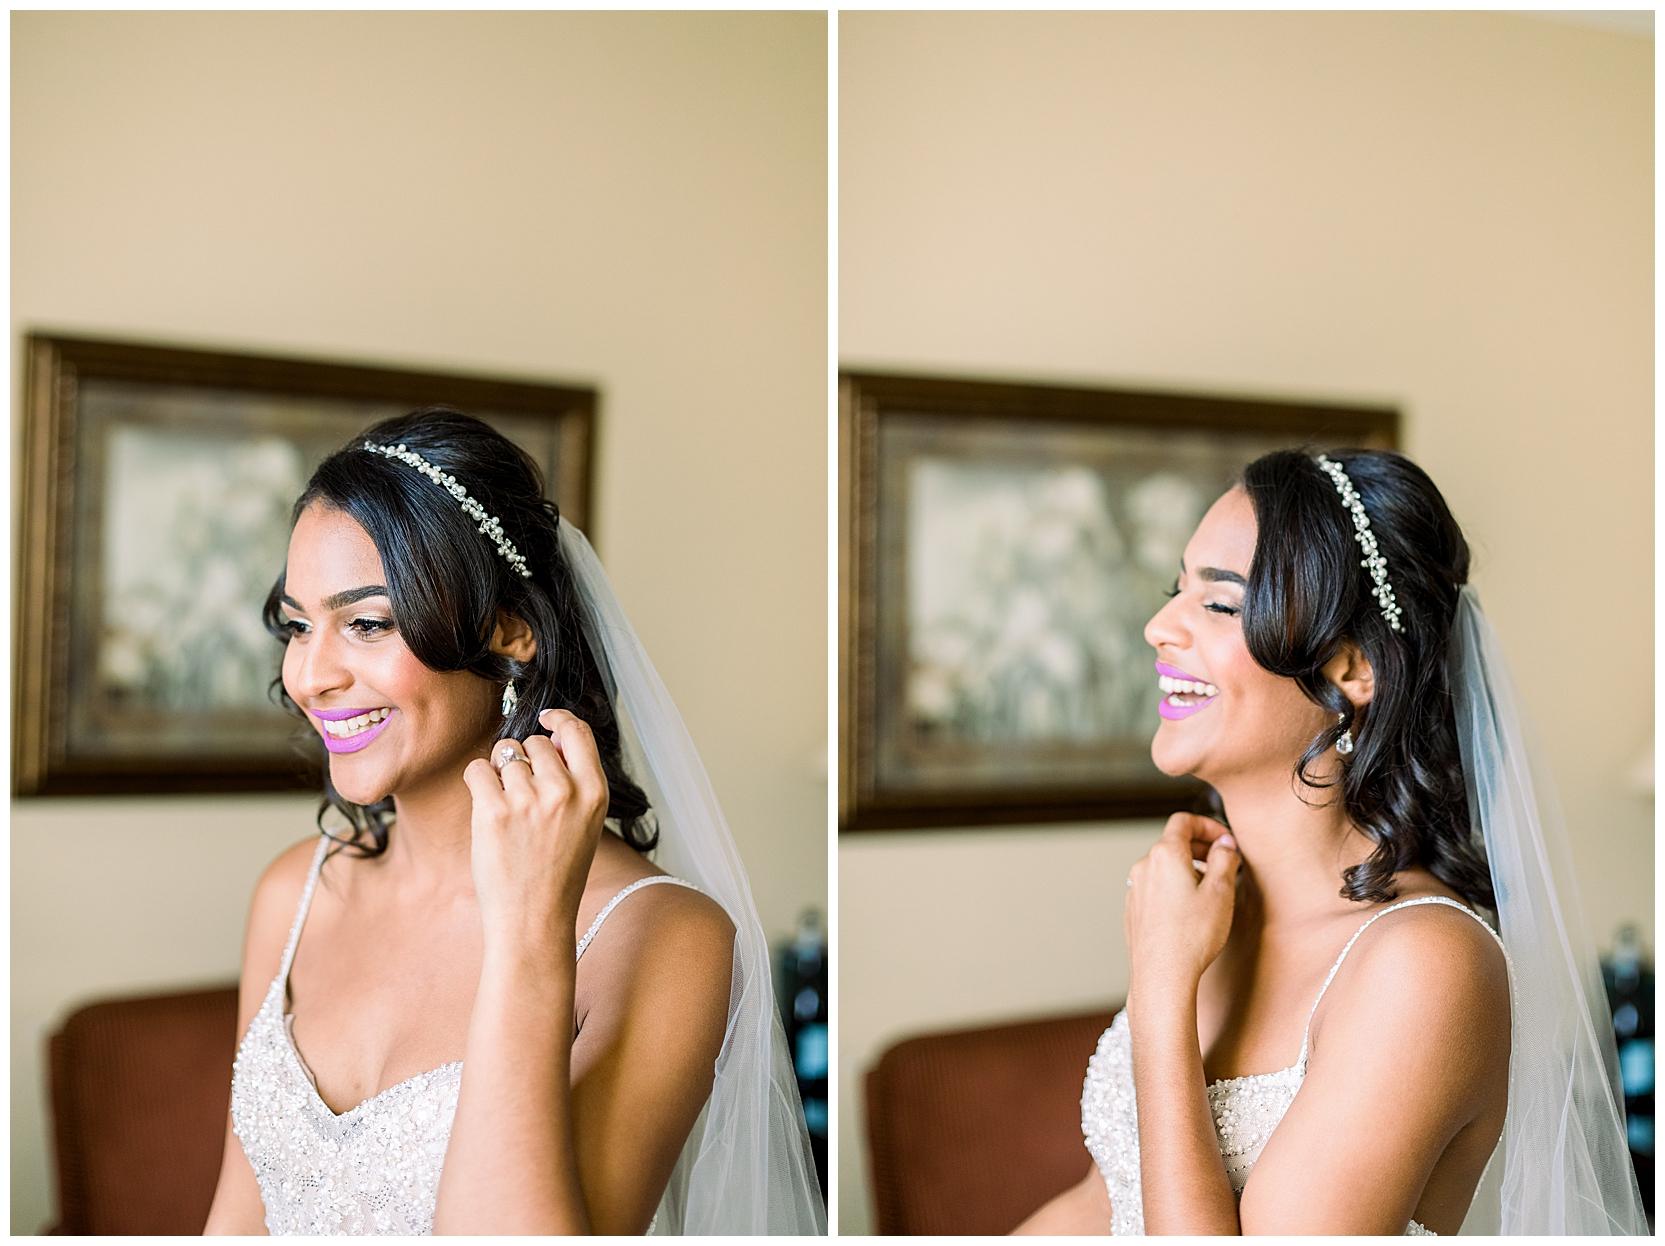 jessicafredericks_lakeland_tampa_wedding_purple_crazy hour_0013.jpg